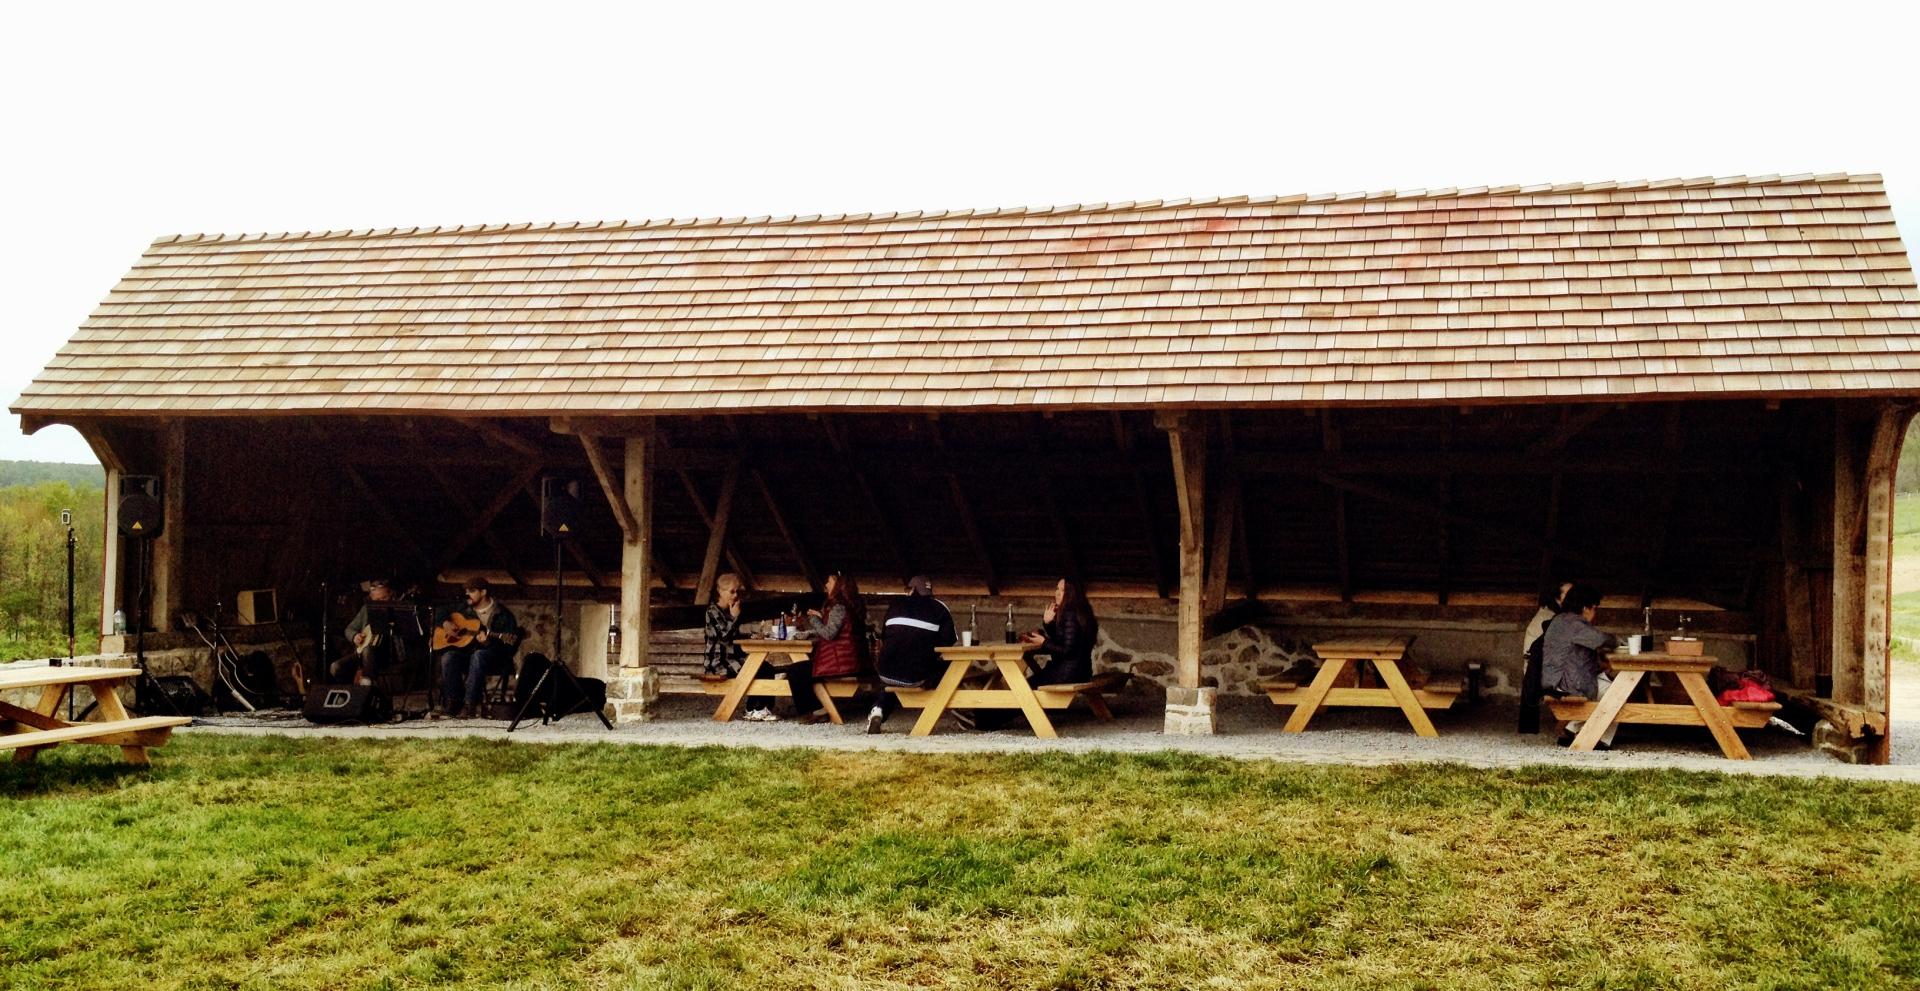 Wyebrook Farm